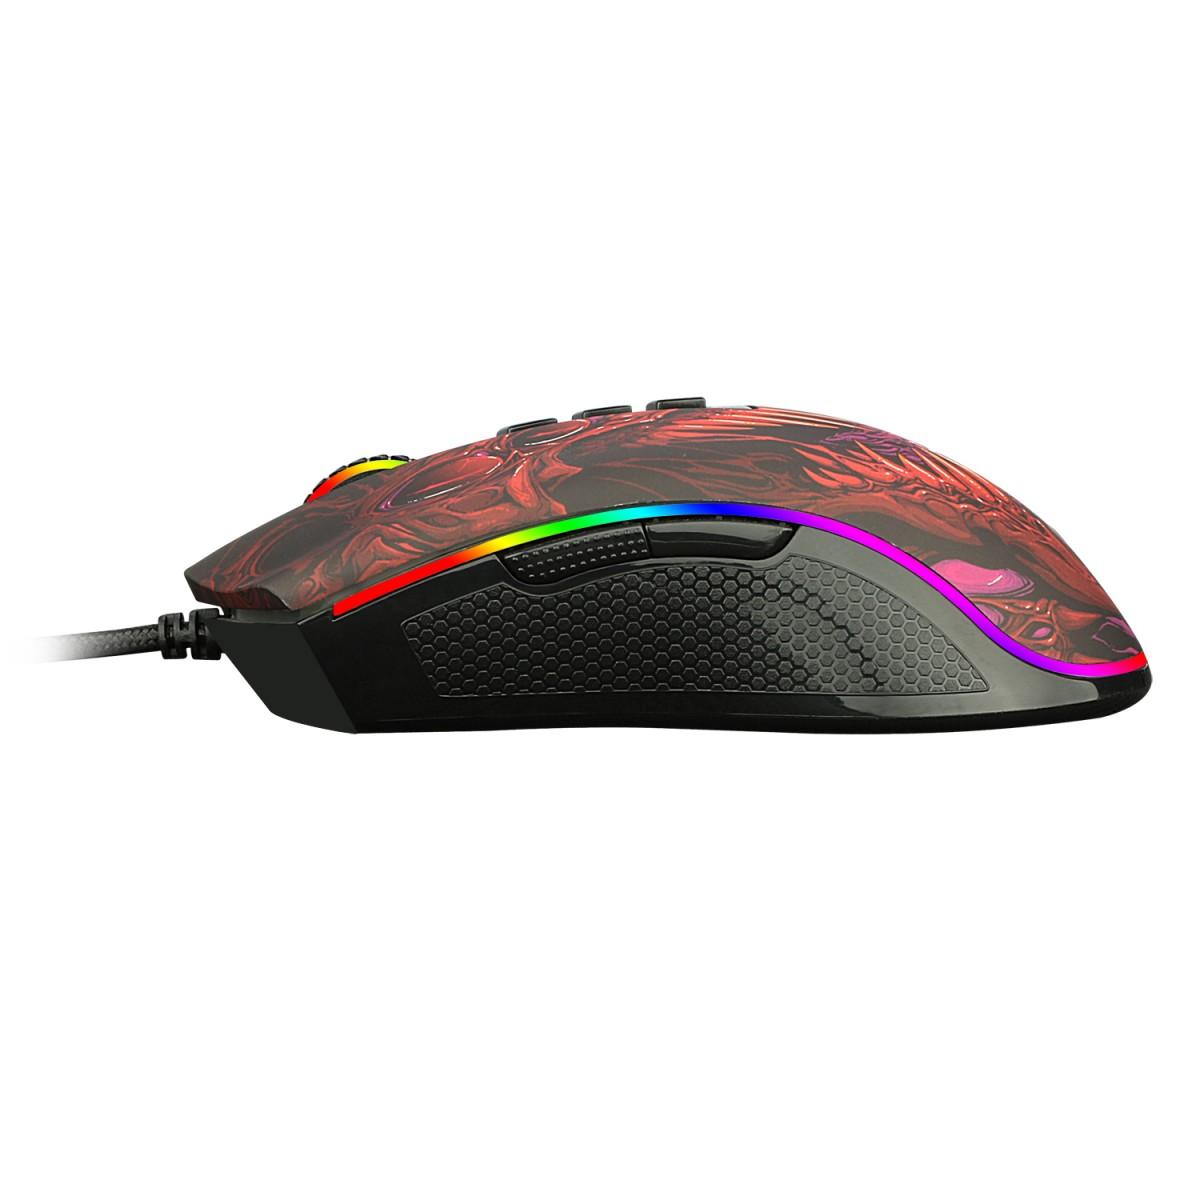 Mouse Gamer Redragon Infernal RYU, 16000 DPI, 8 Botões, RGB, ID711